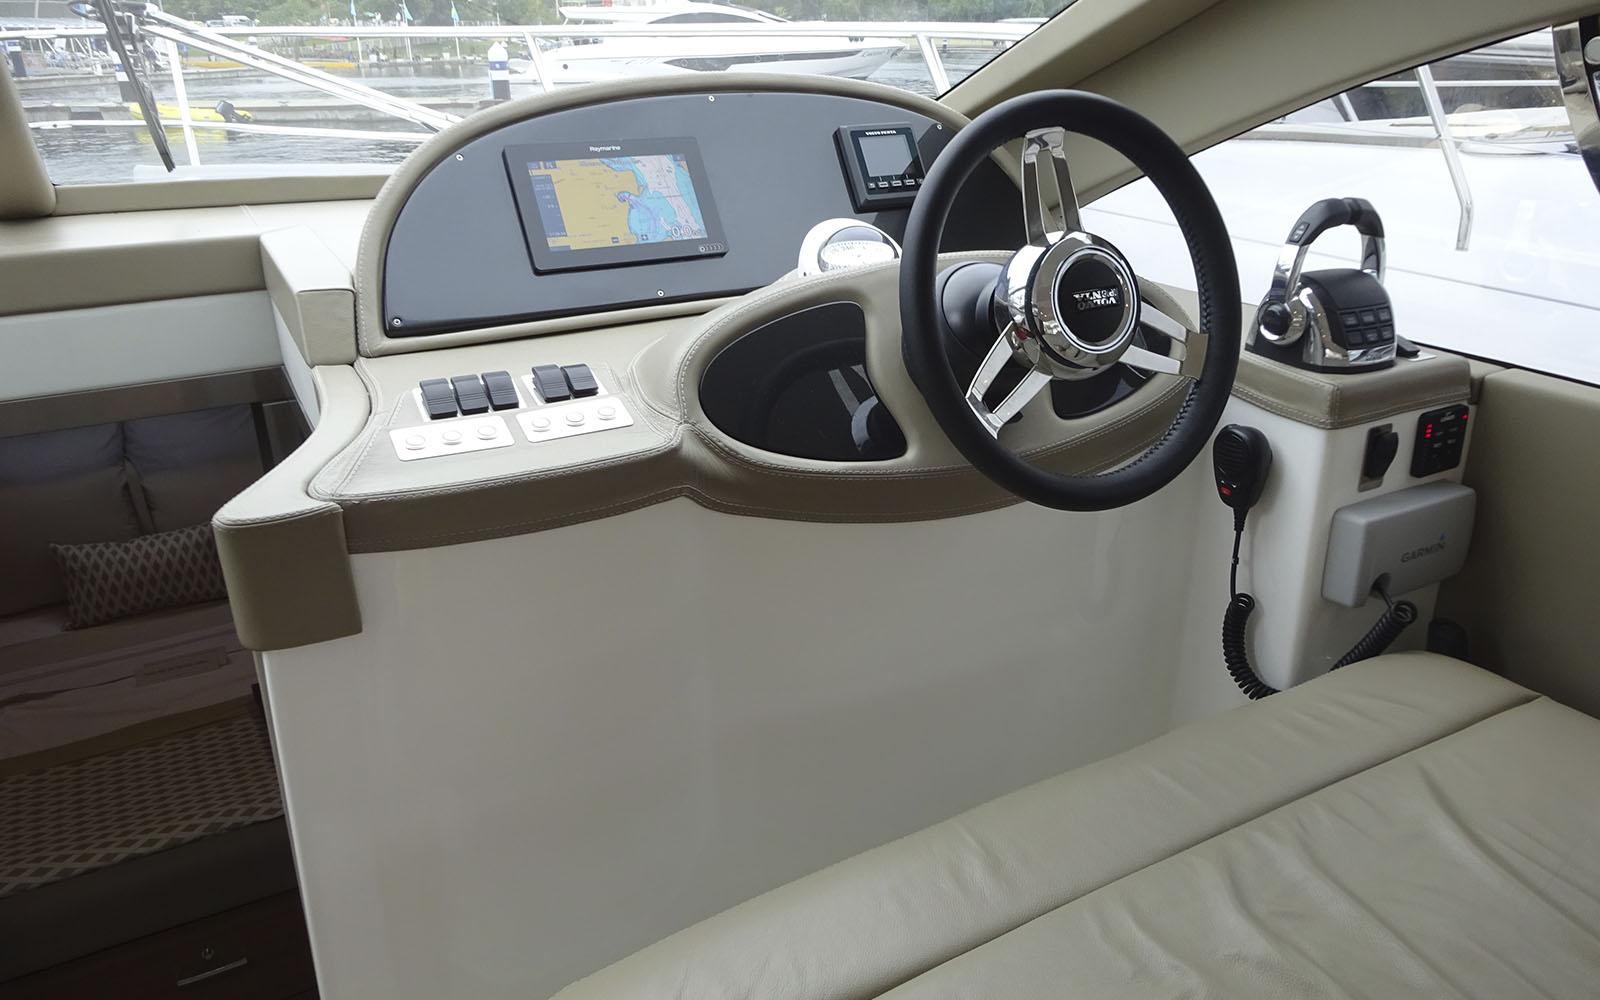 Confira imagens do interior da nova Schaefer 400 Fly-boatshopping